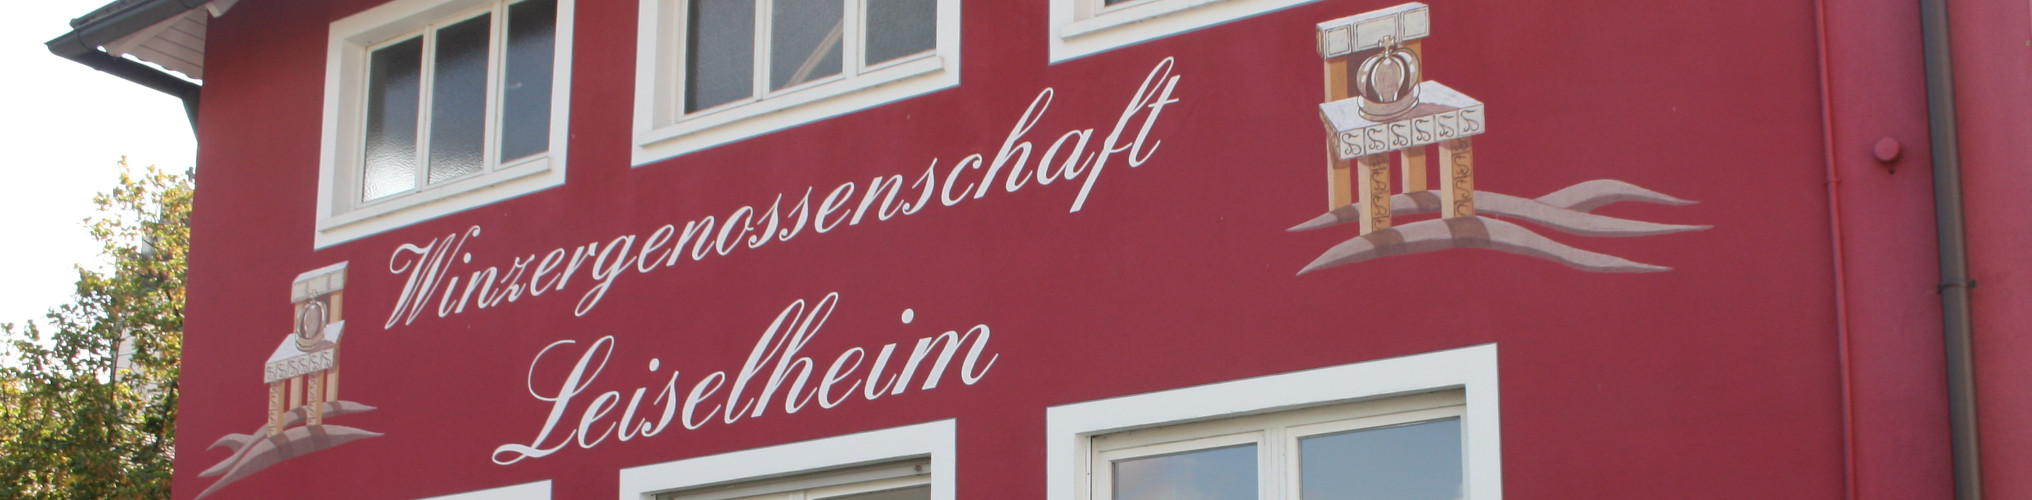 winzergenossenschaft Leiselheim / Kaiserstuhl